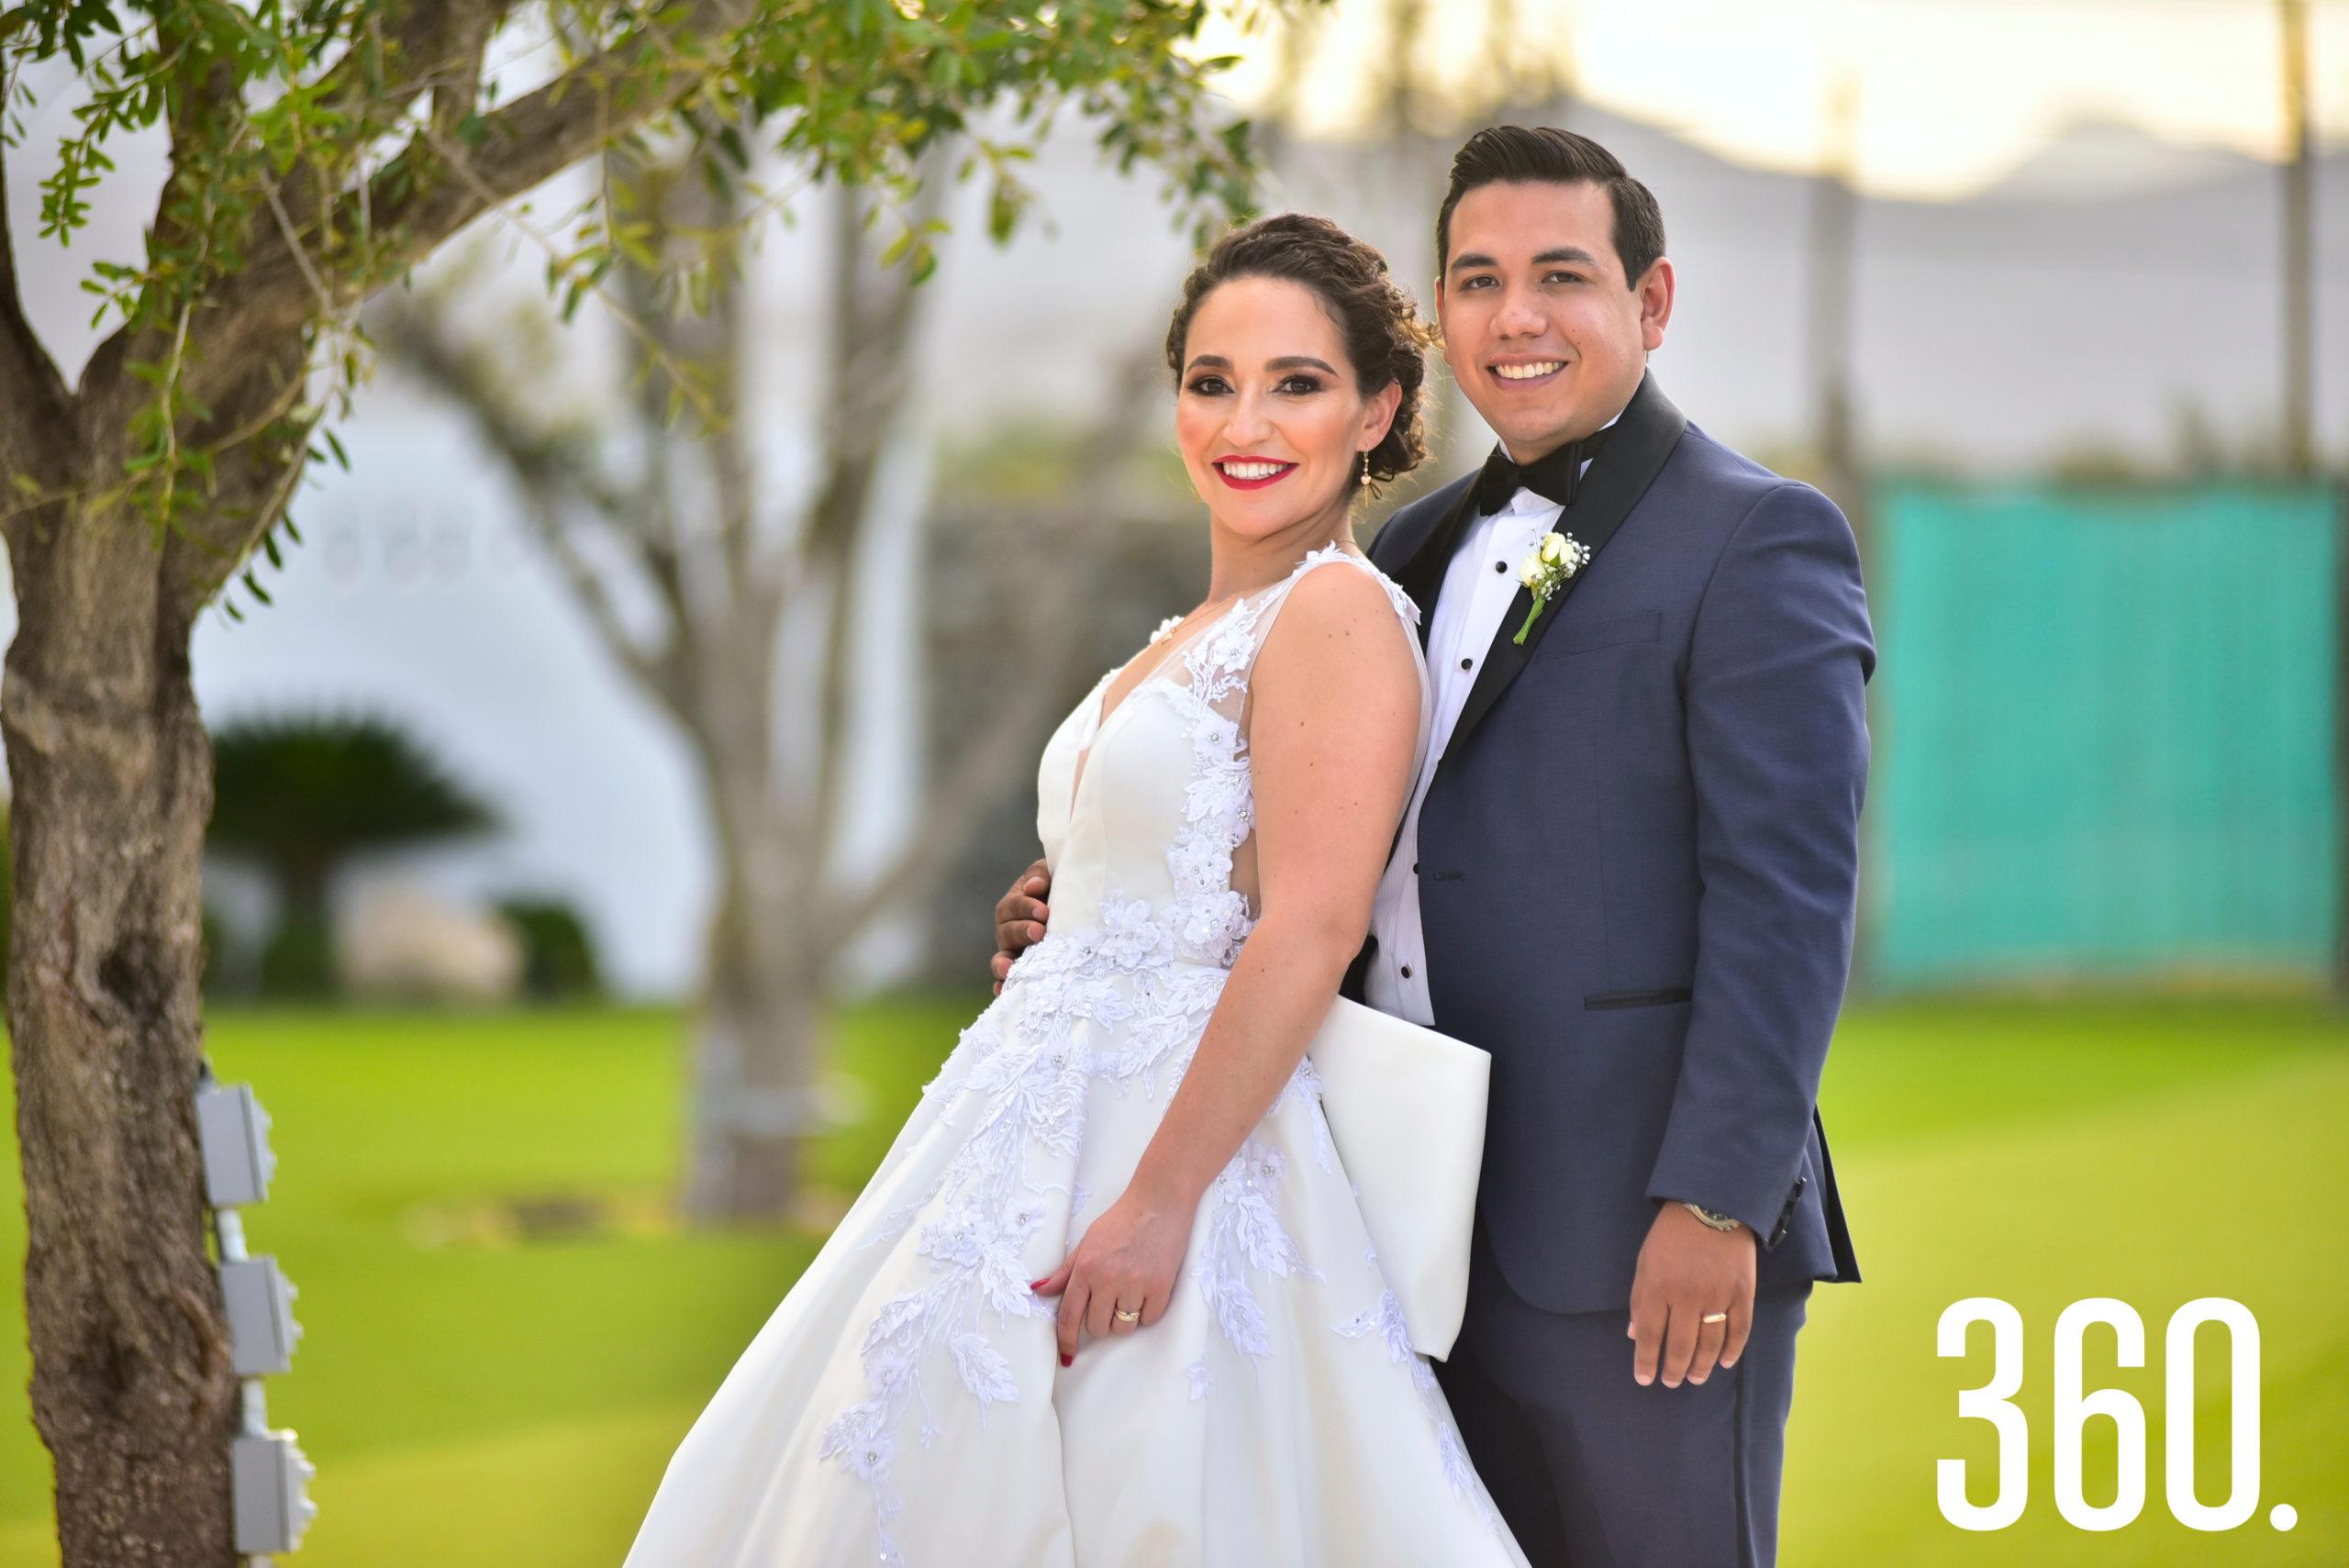 Fabián Trujillo Leija y Ana Cecilia Romero Ramos.